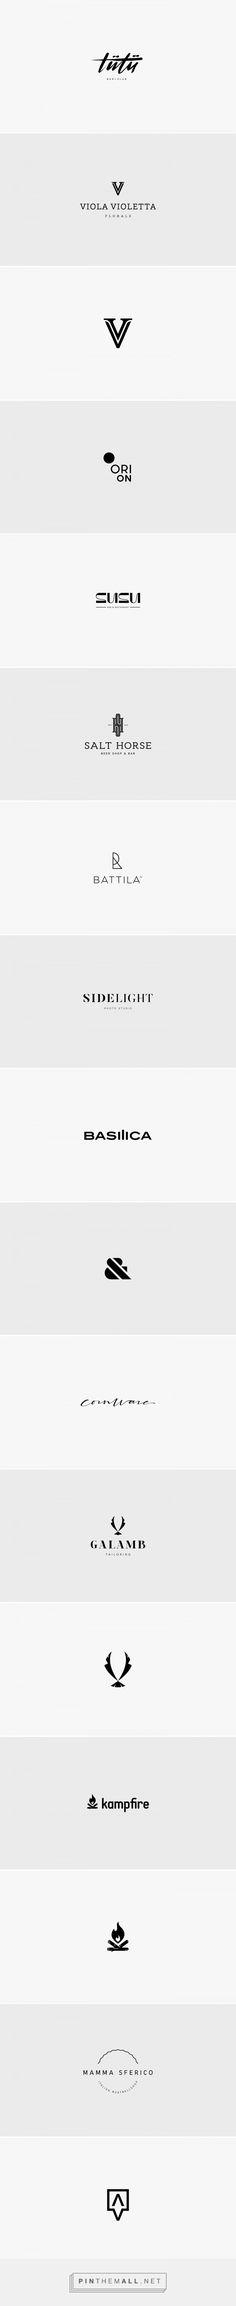 Logofolio 2 on Behance